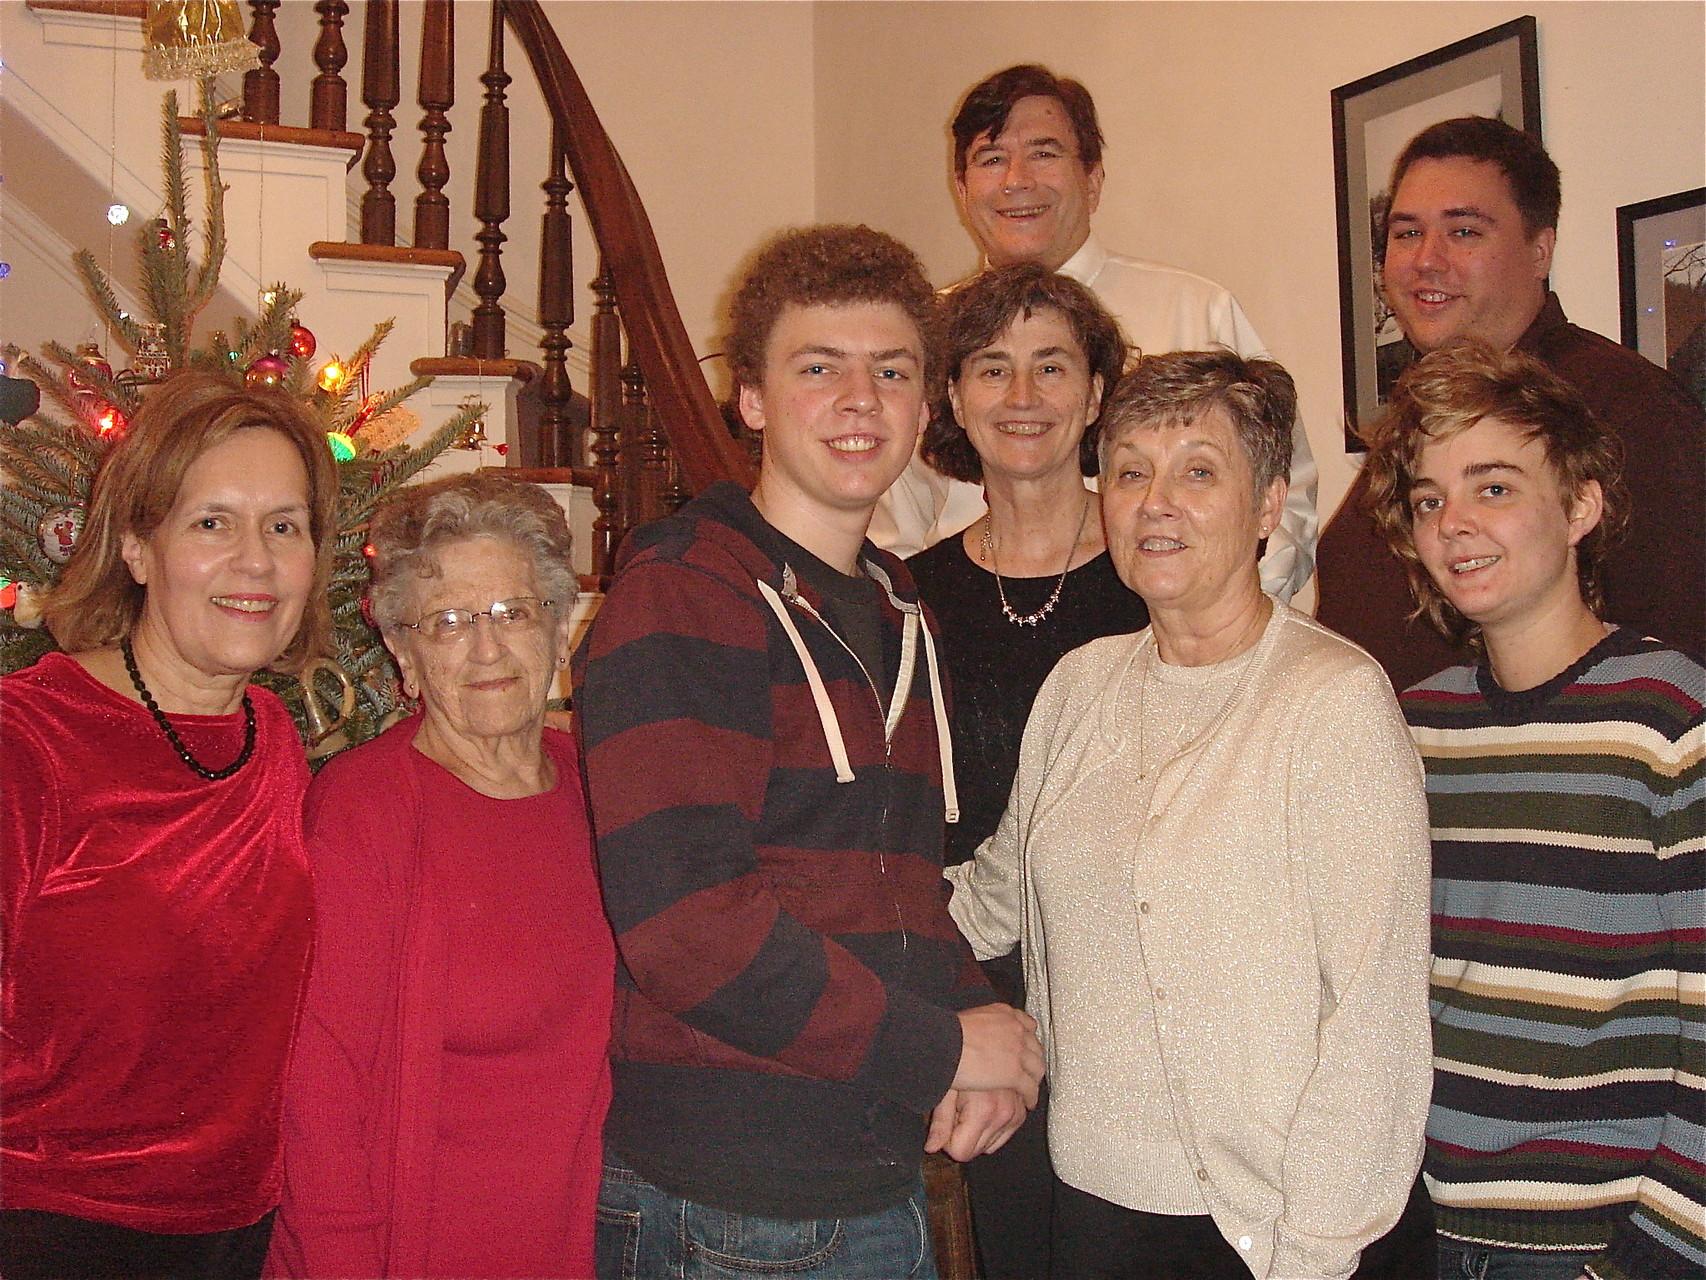 Lorraine, Mary Lou, Ben, Ann, John (behind Ann), Cindy, Greg & Kathleen Xmas Day 2014